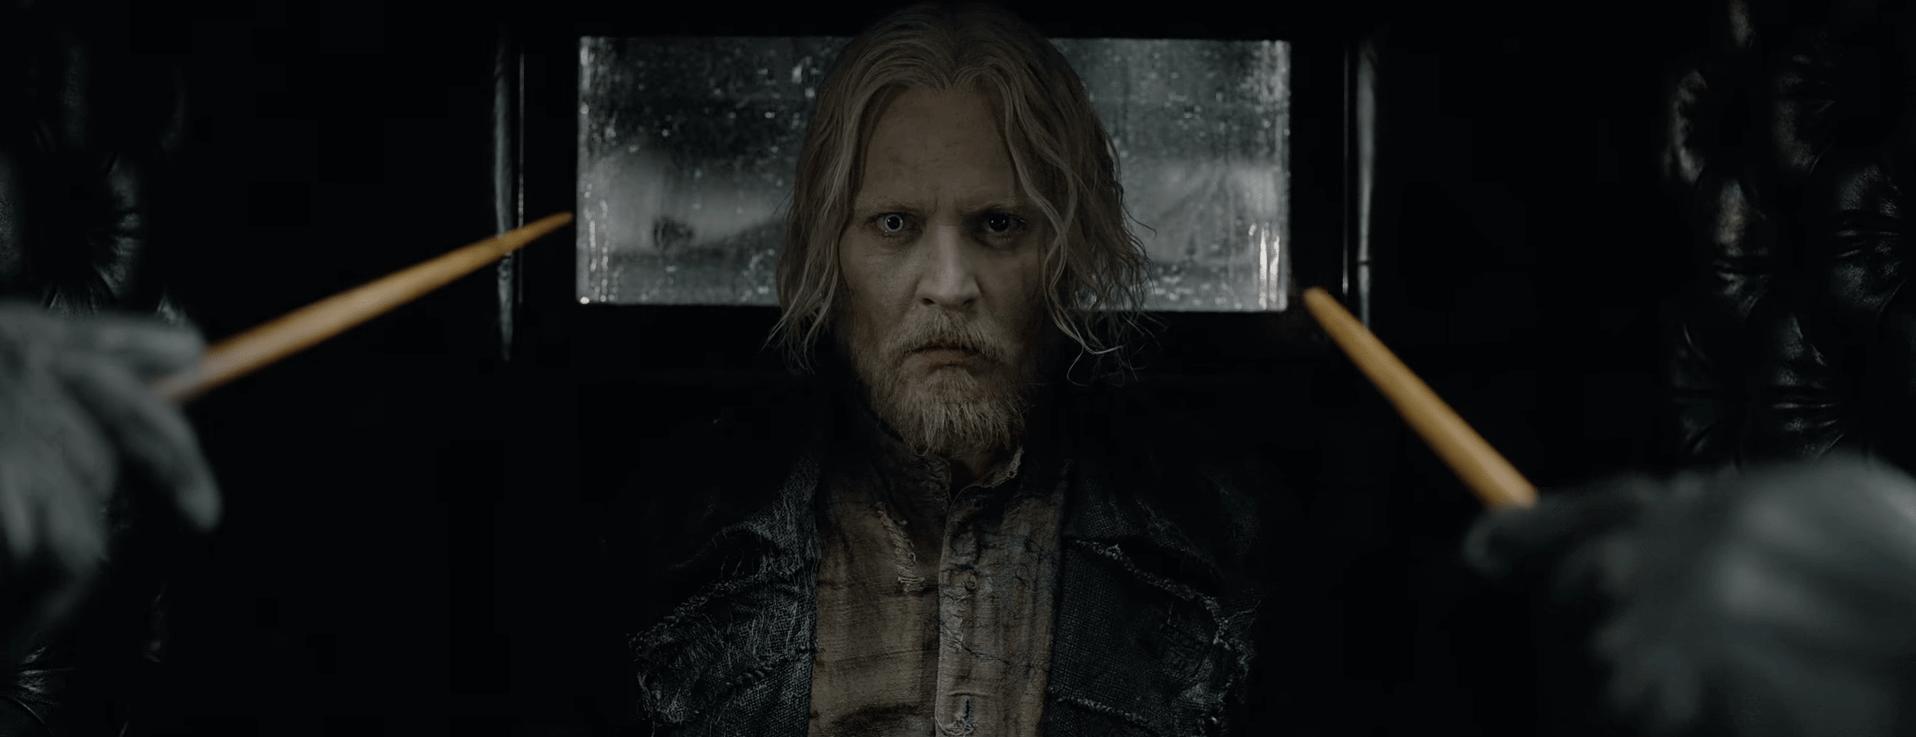 asasdas - Primeiro trailer de Animais Fantásticos: Os Crimes de Grindelwald é lançado!